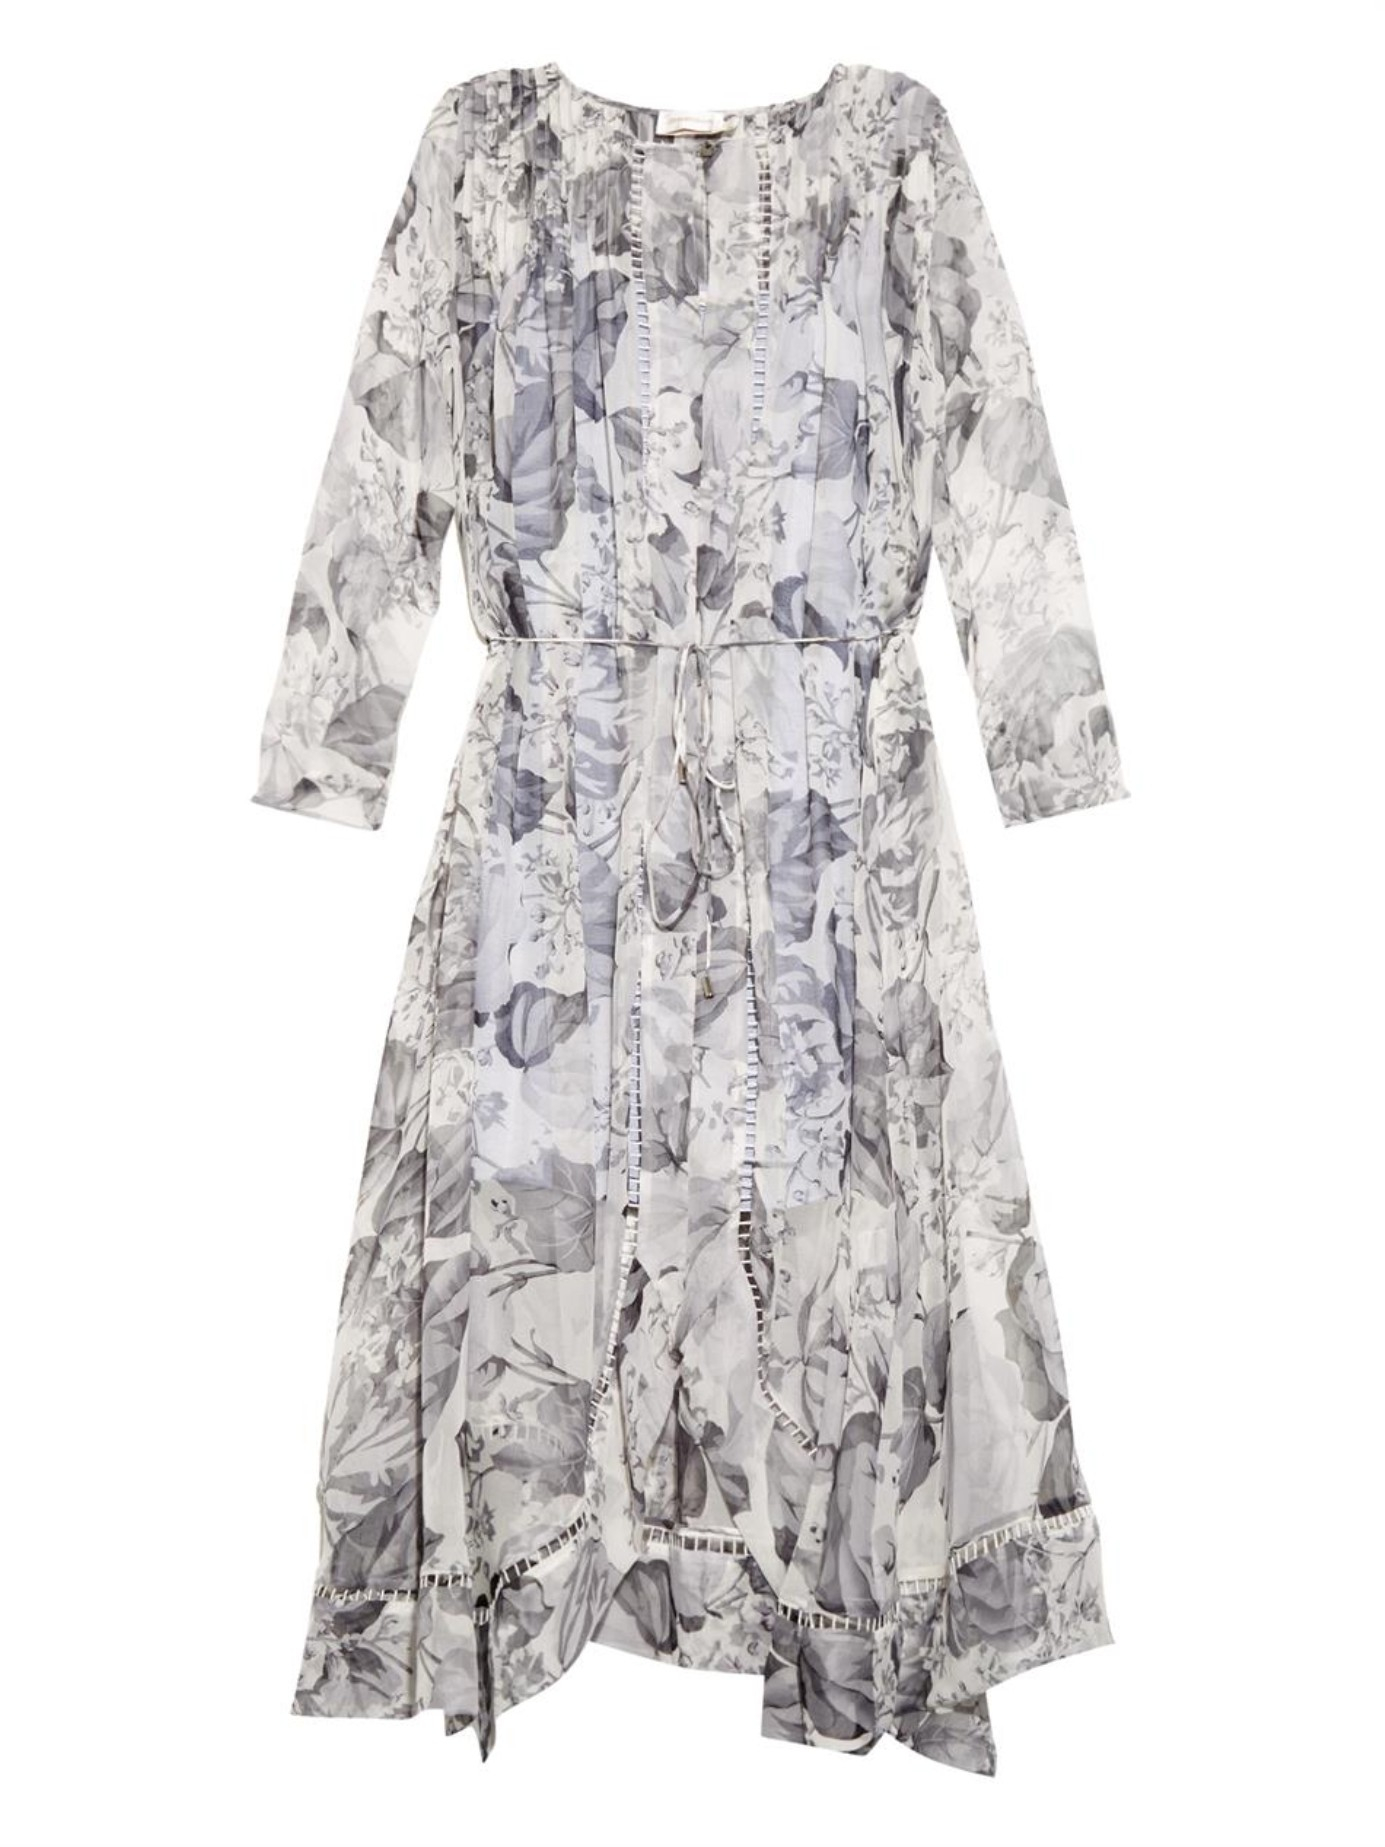 Zimmermann Seer Floral Print Silk Dress In Gray Lyst